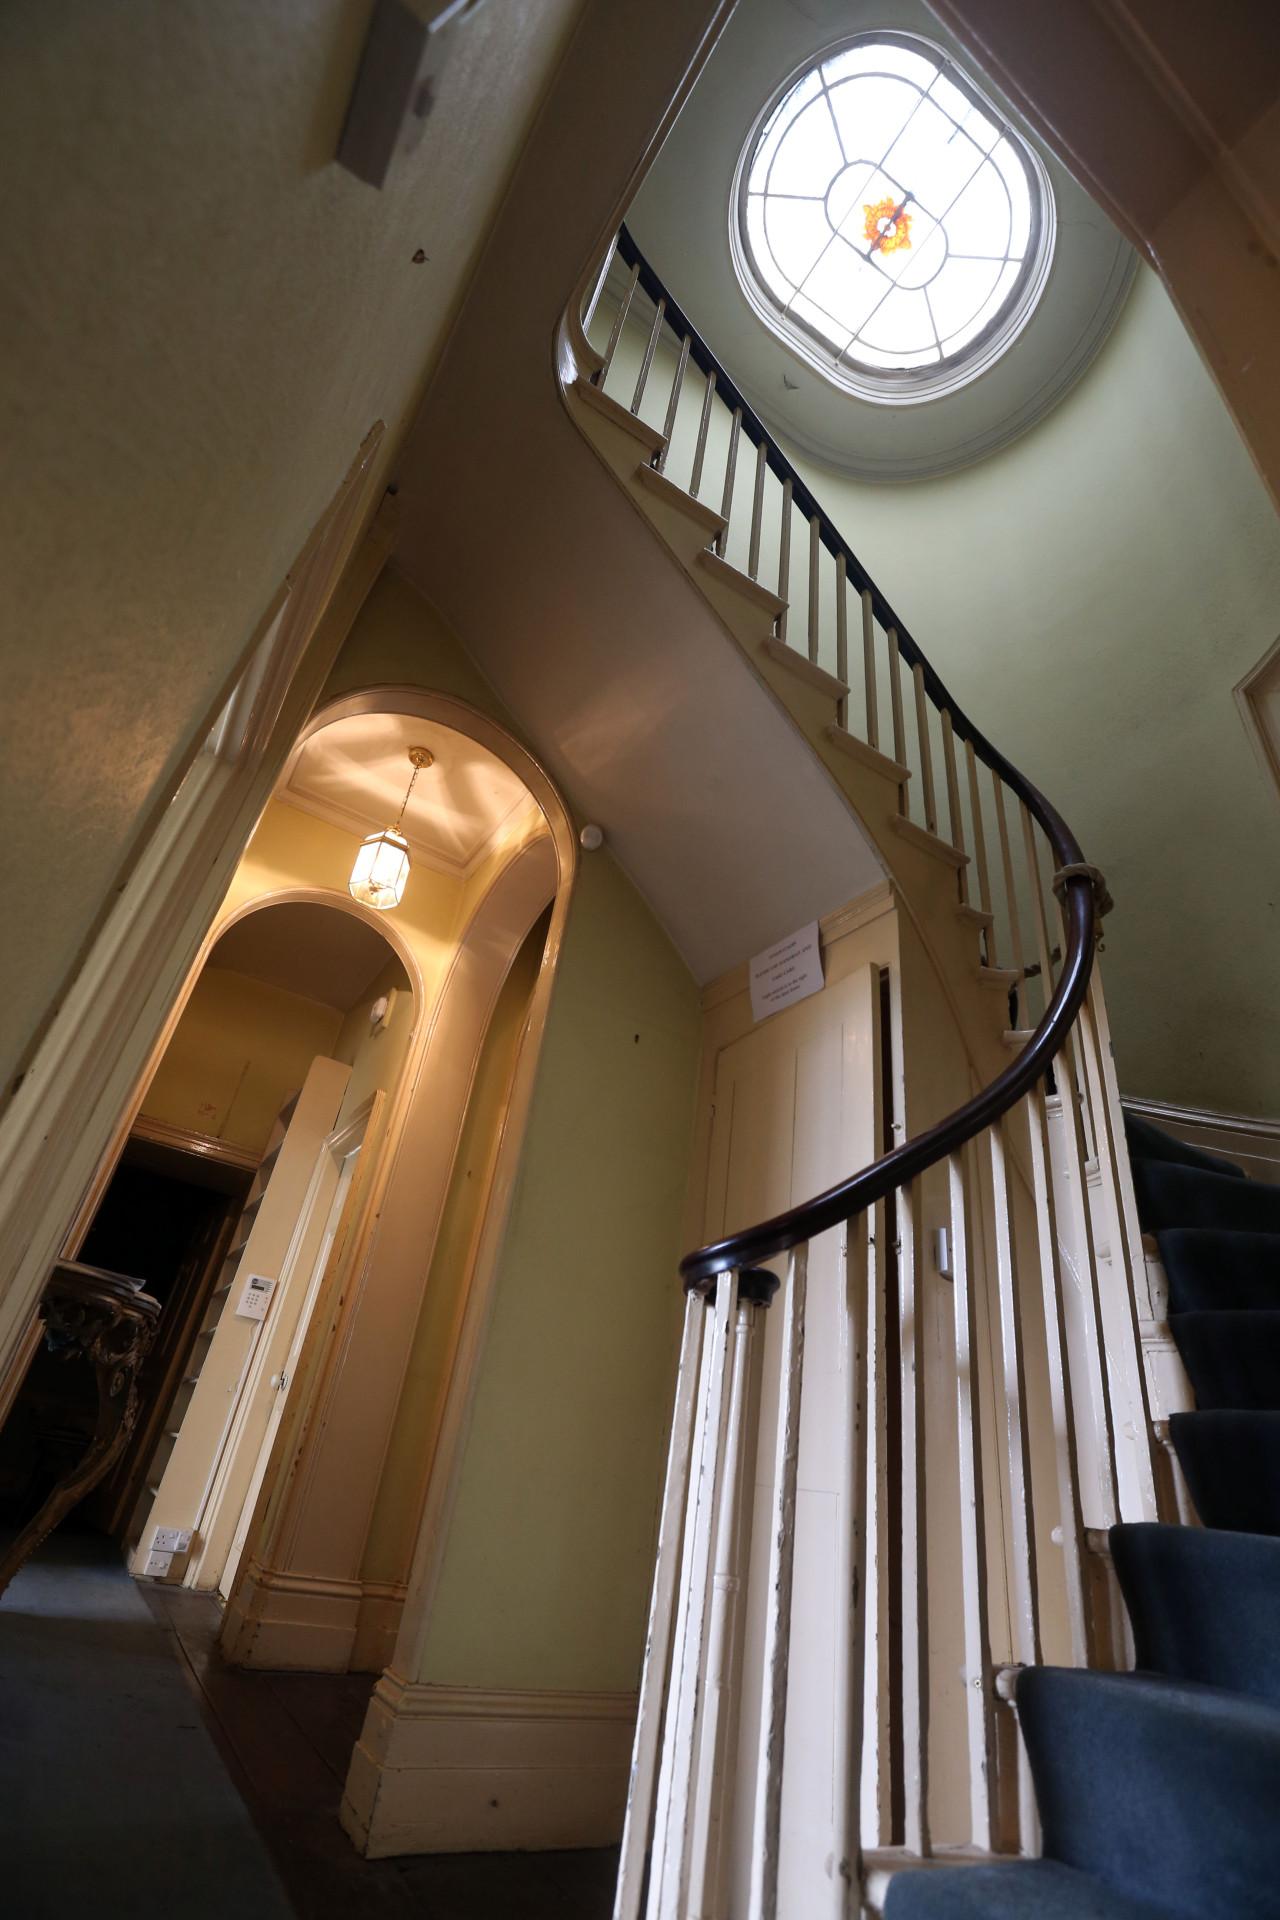 Staircase at Turner's House, Twickenham. Image courtesy turnerintwickenham.org